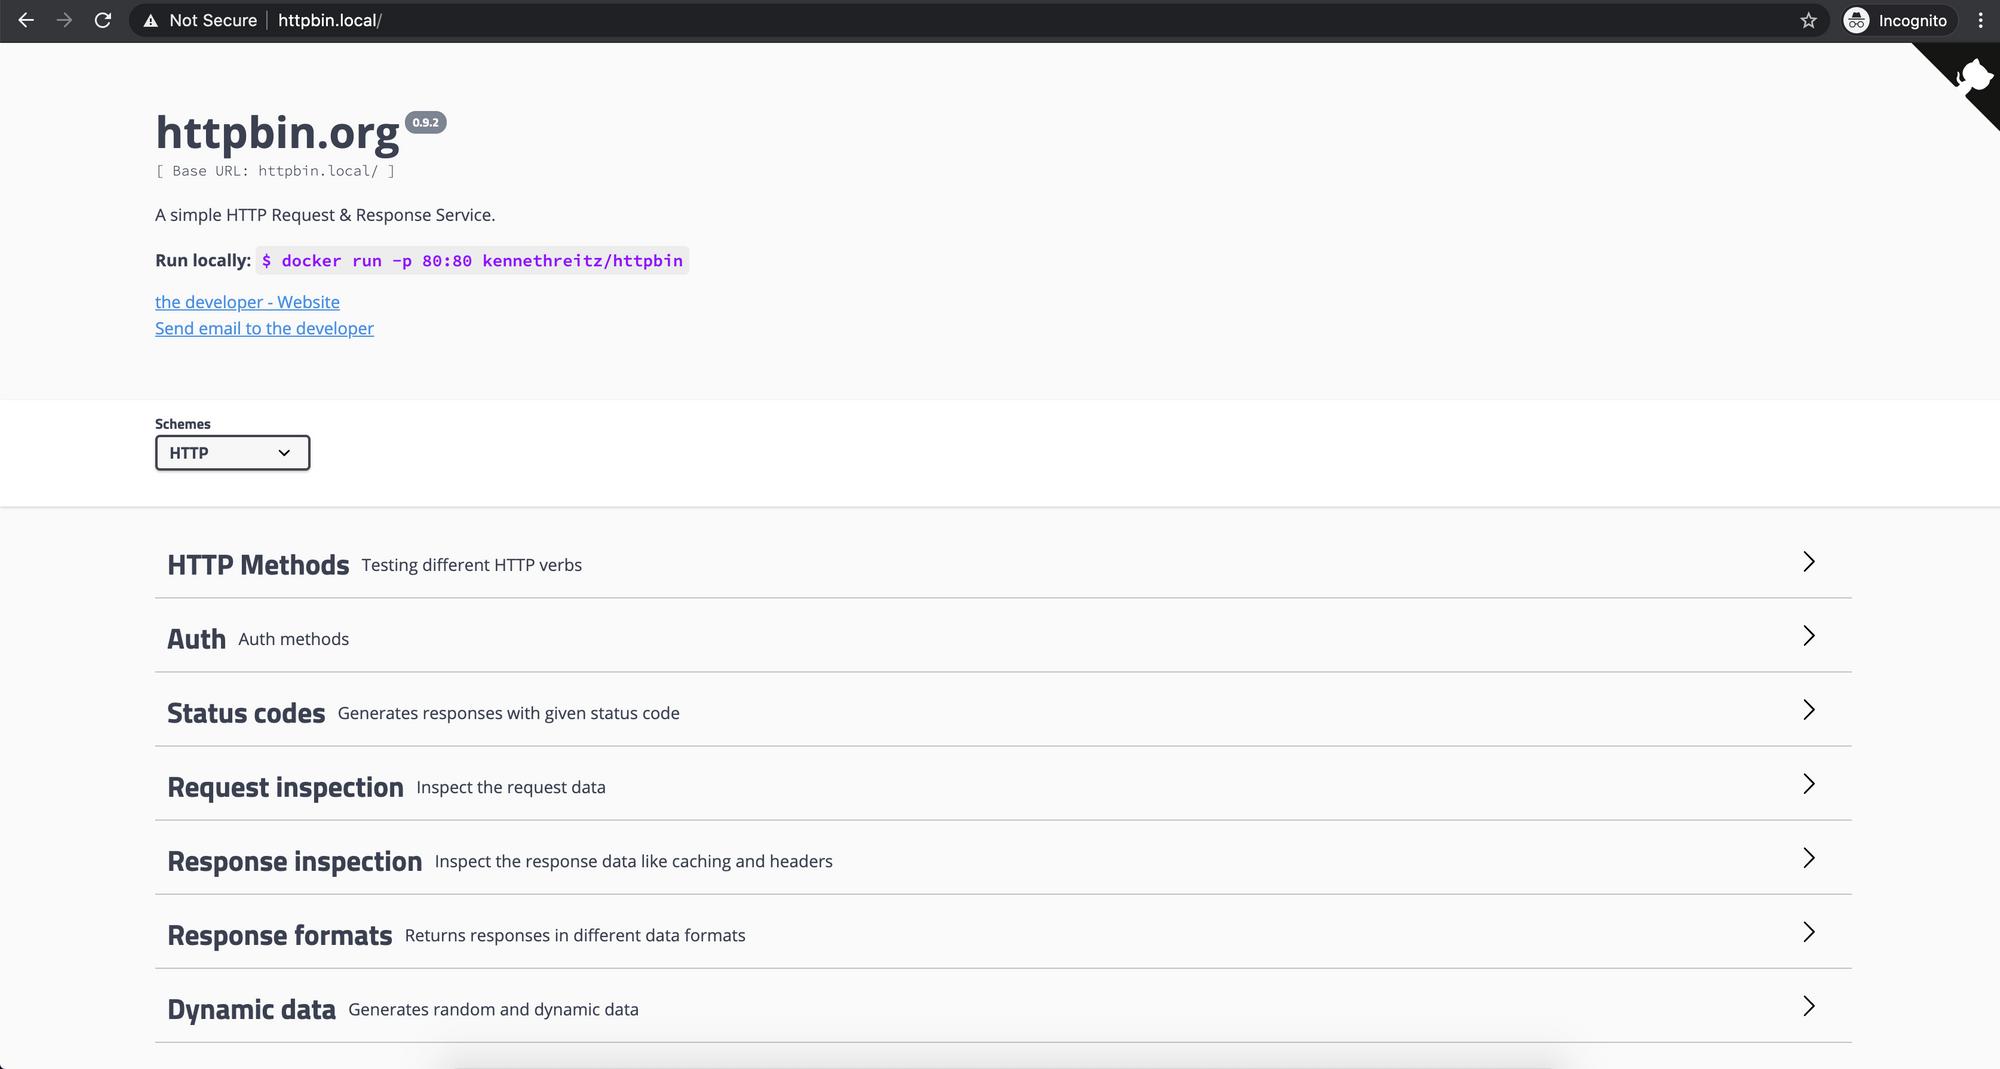 Screenshot of the HTTPBin application